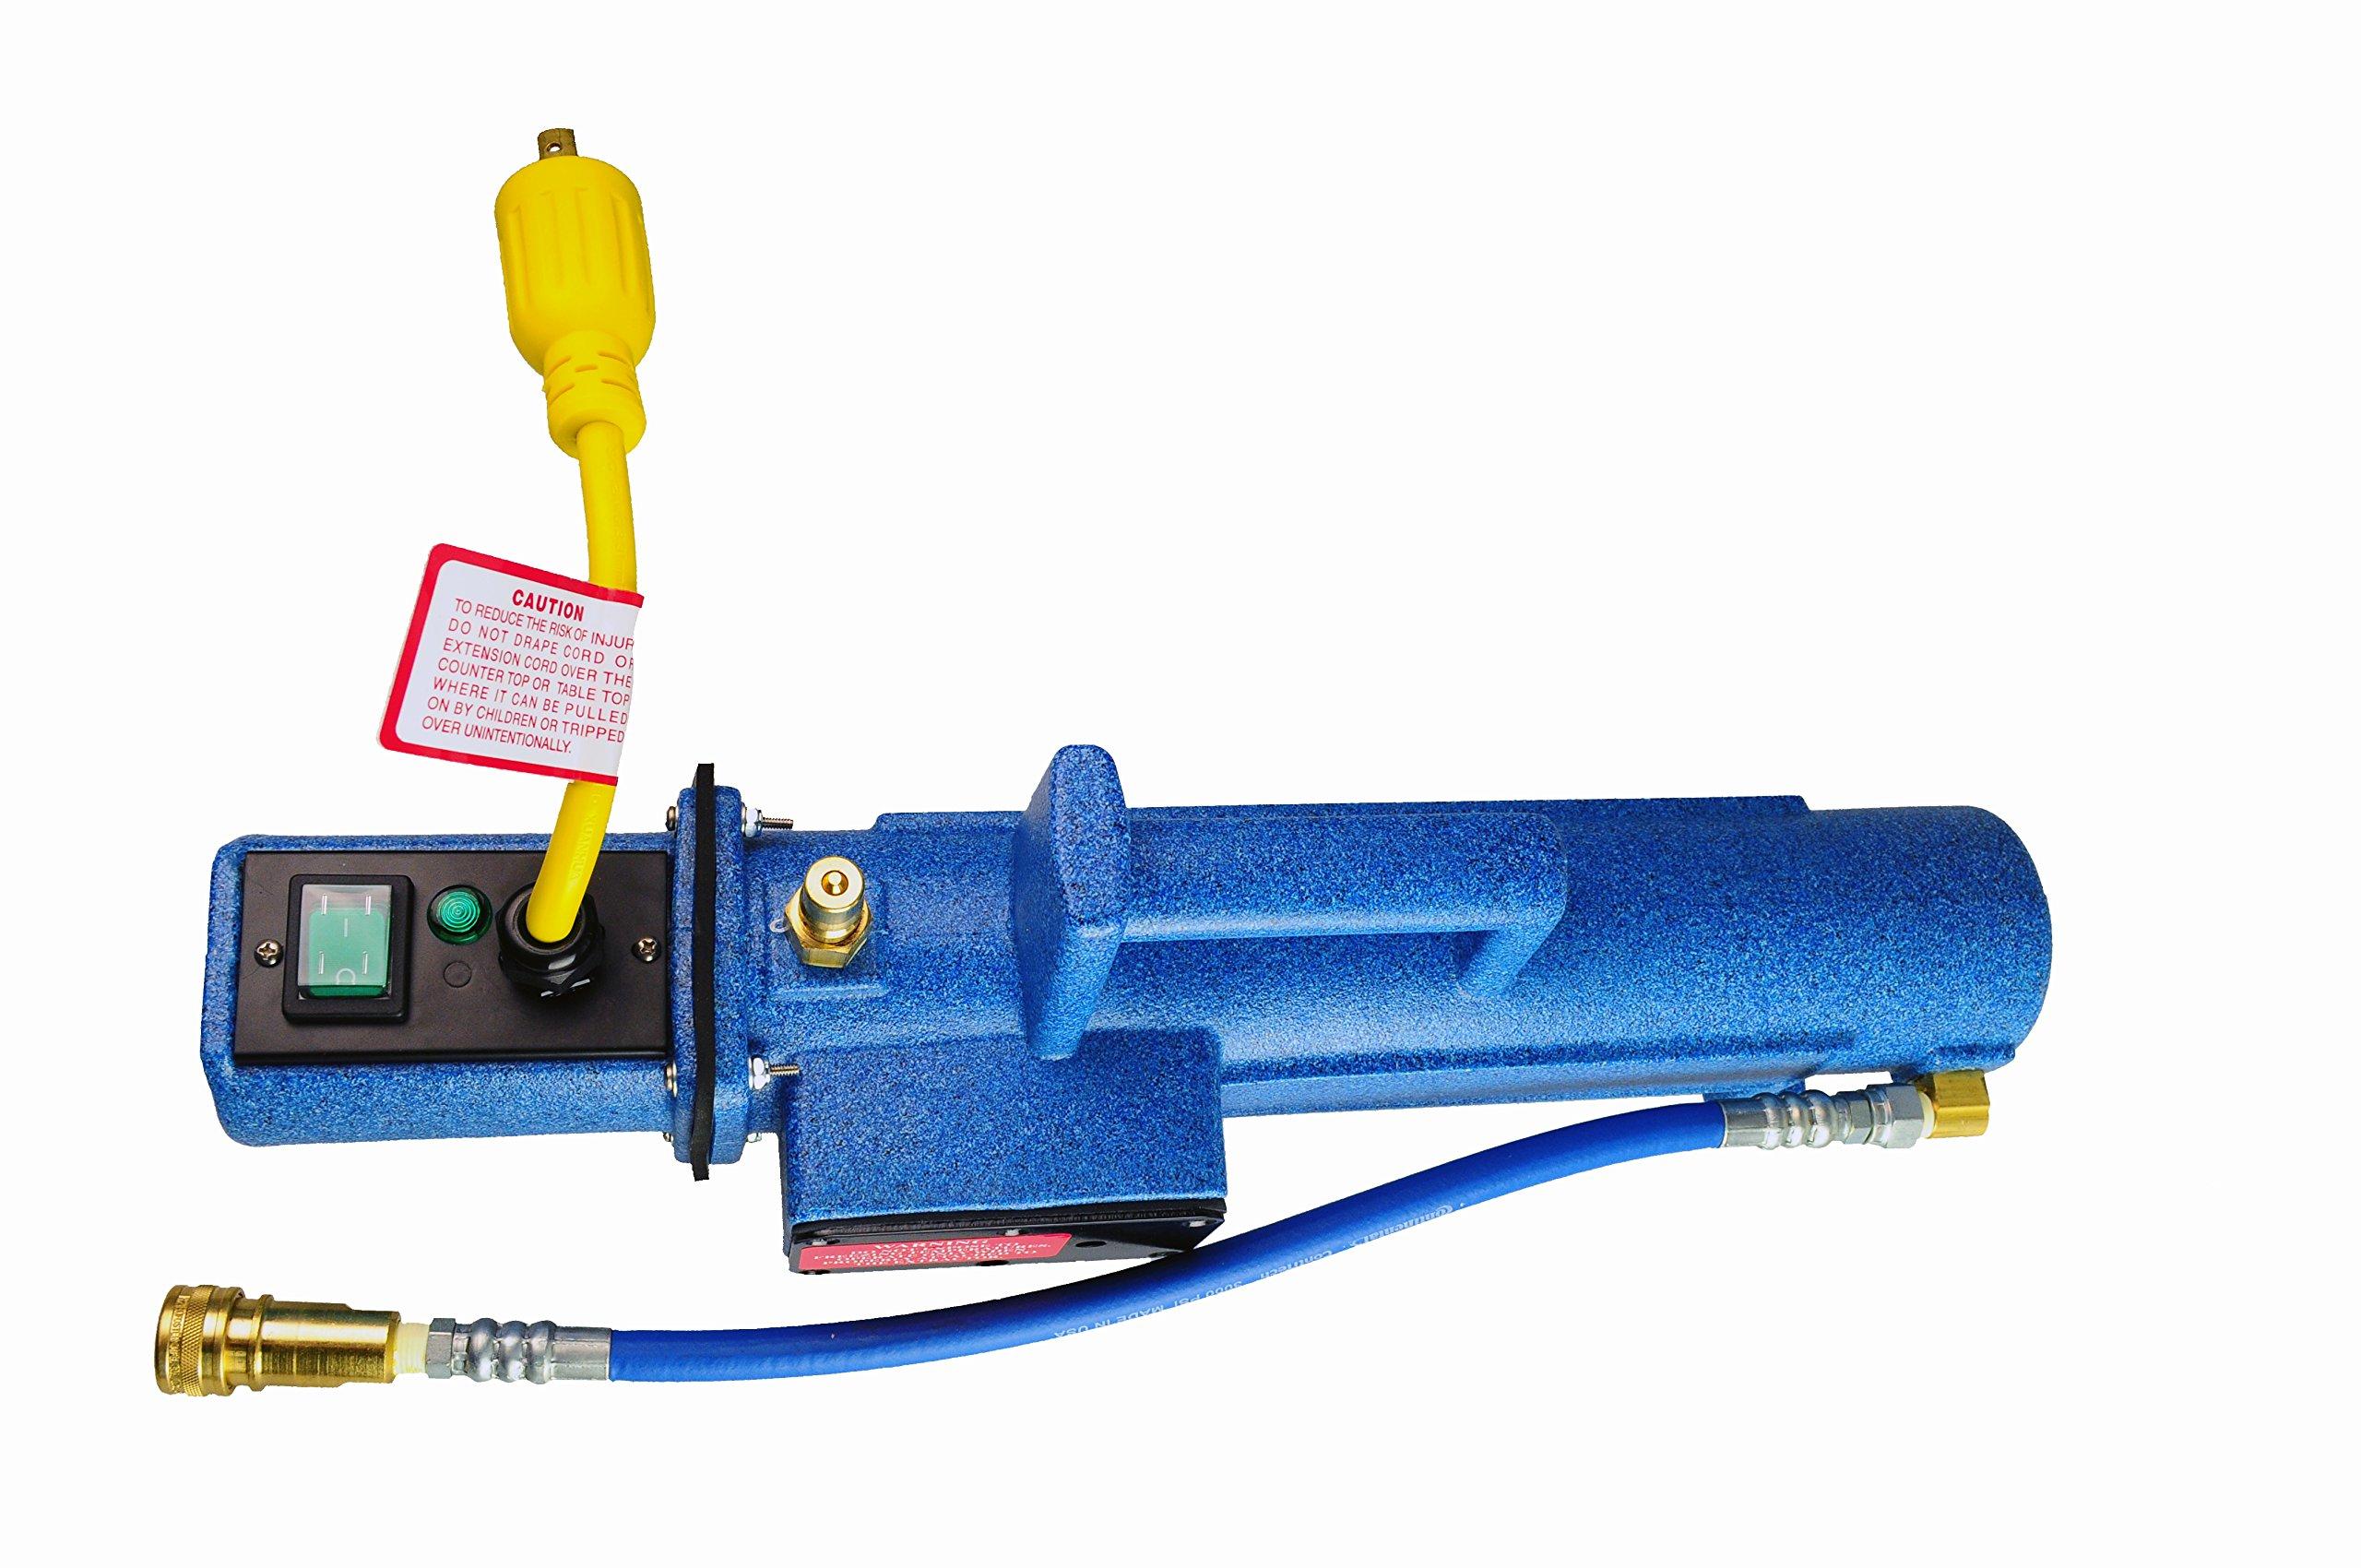 EDIC Heat 'N Run External Heater System